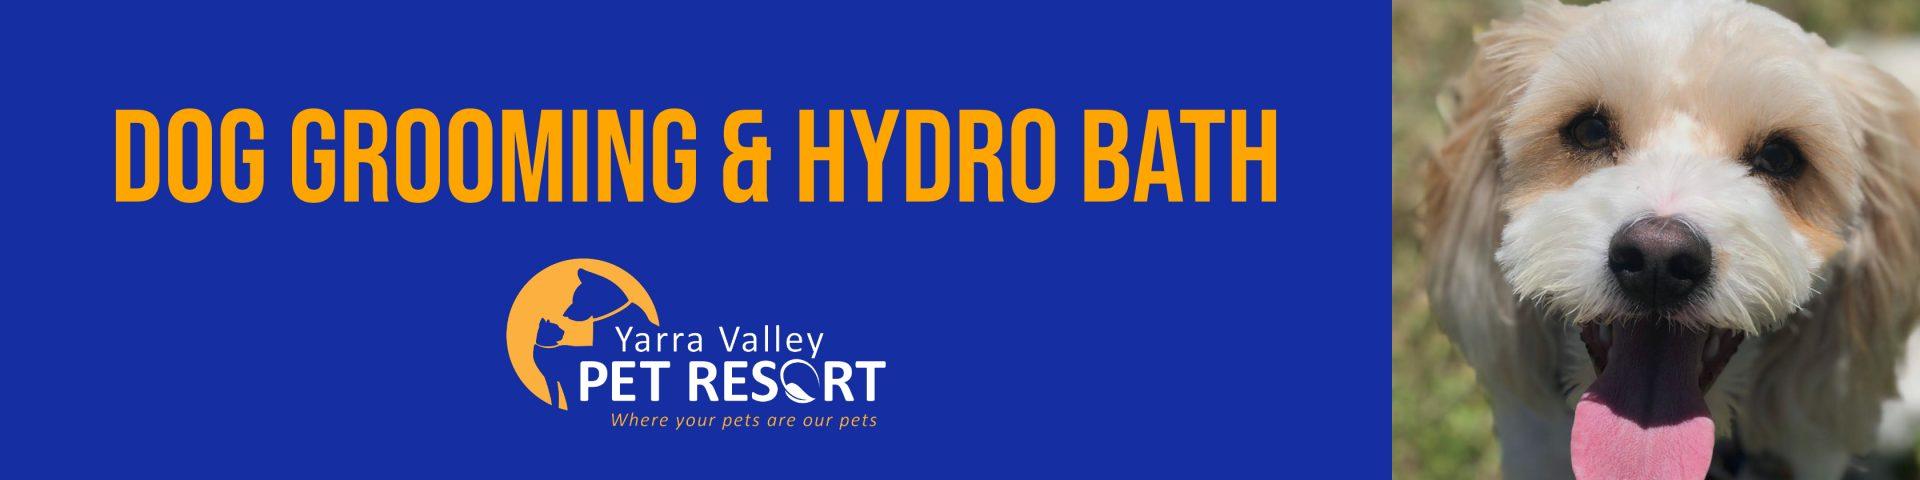 Dog Grooming & Hydro Bath Healesville Yarra Valley